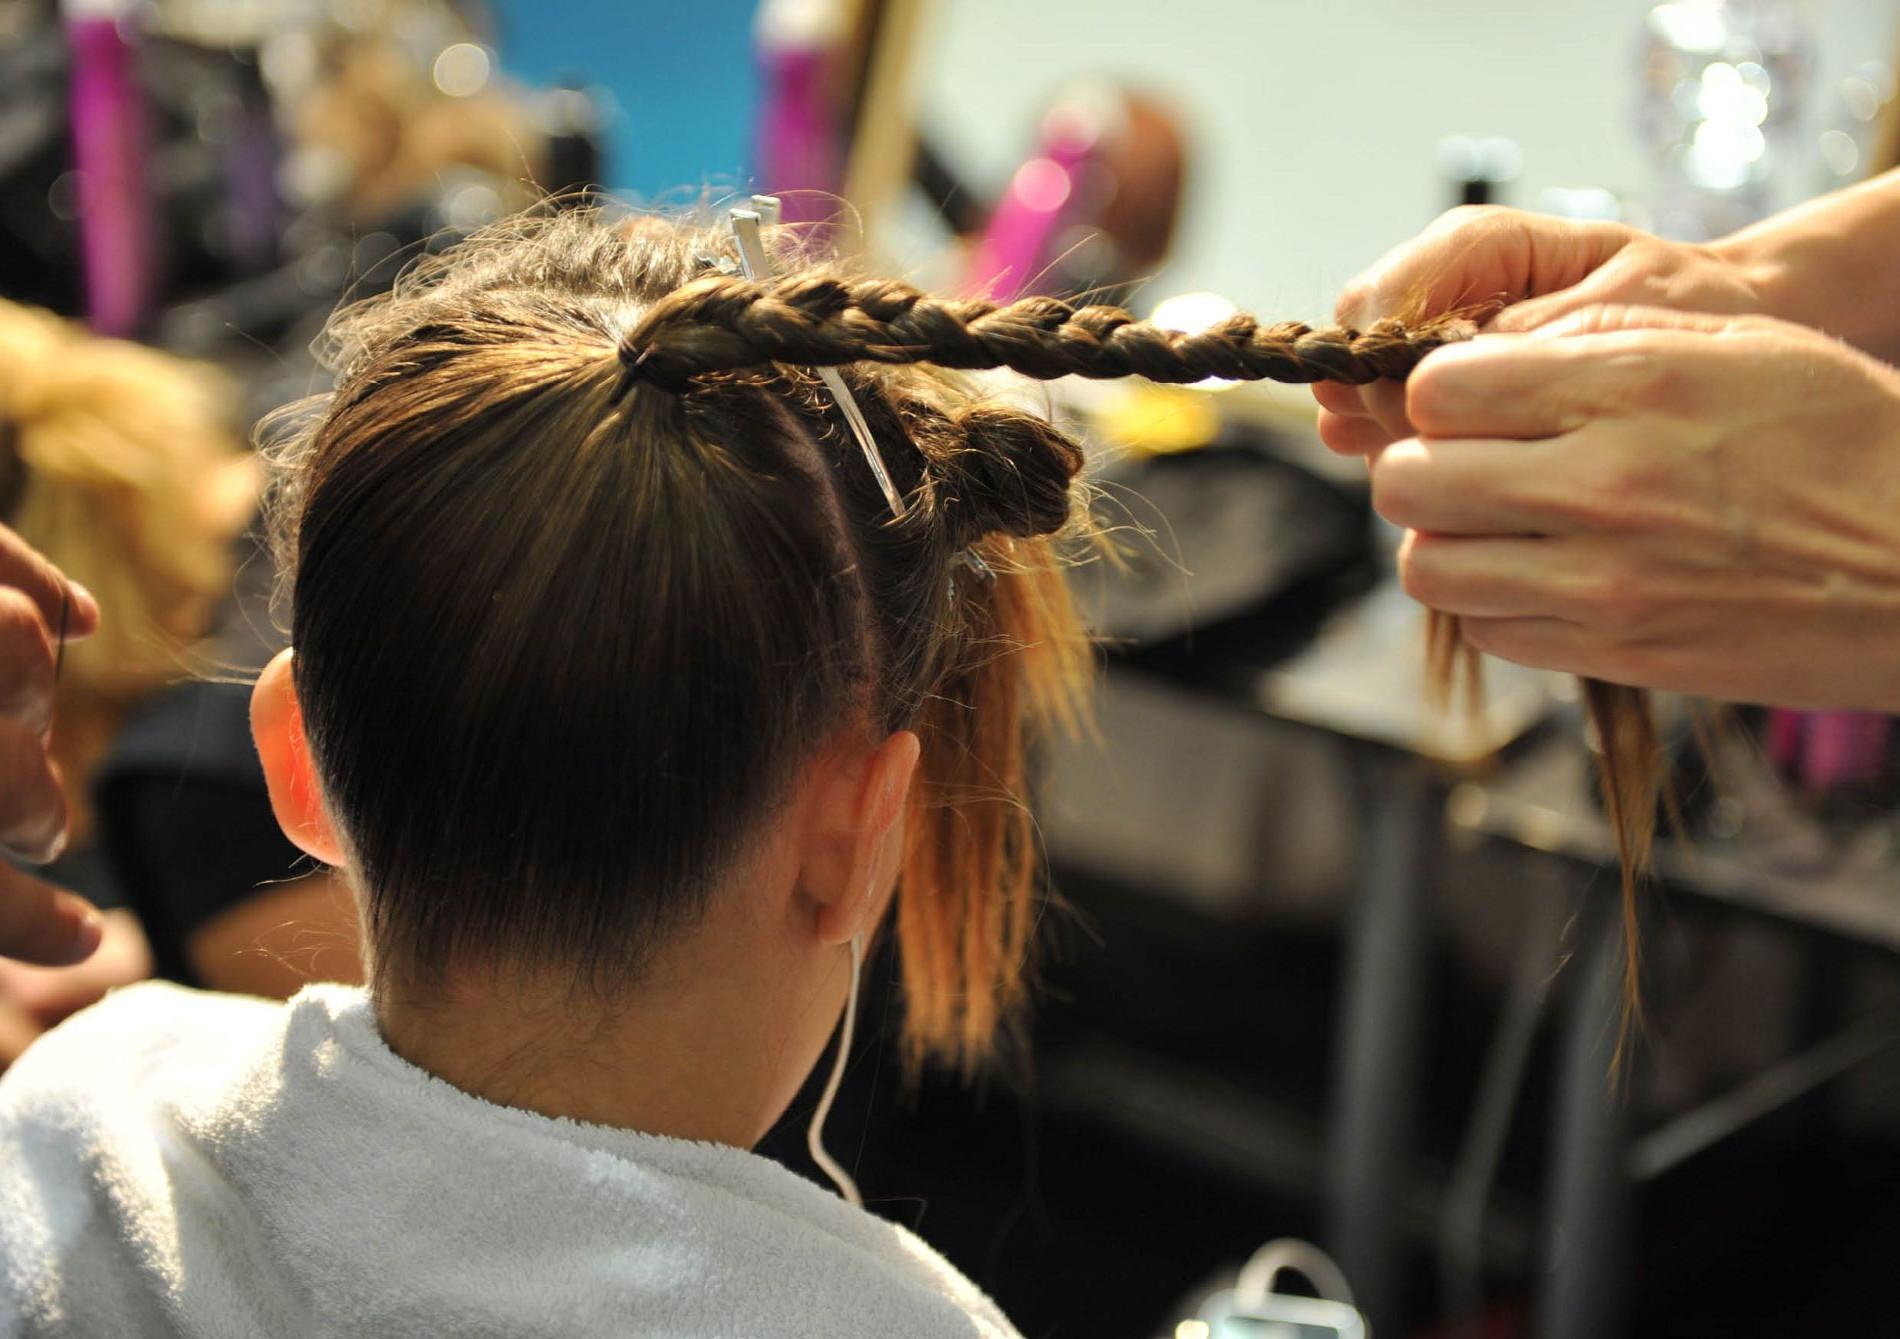 Backstage Antonio Marras Spring Summer 2013 Hair Stylist